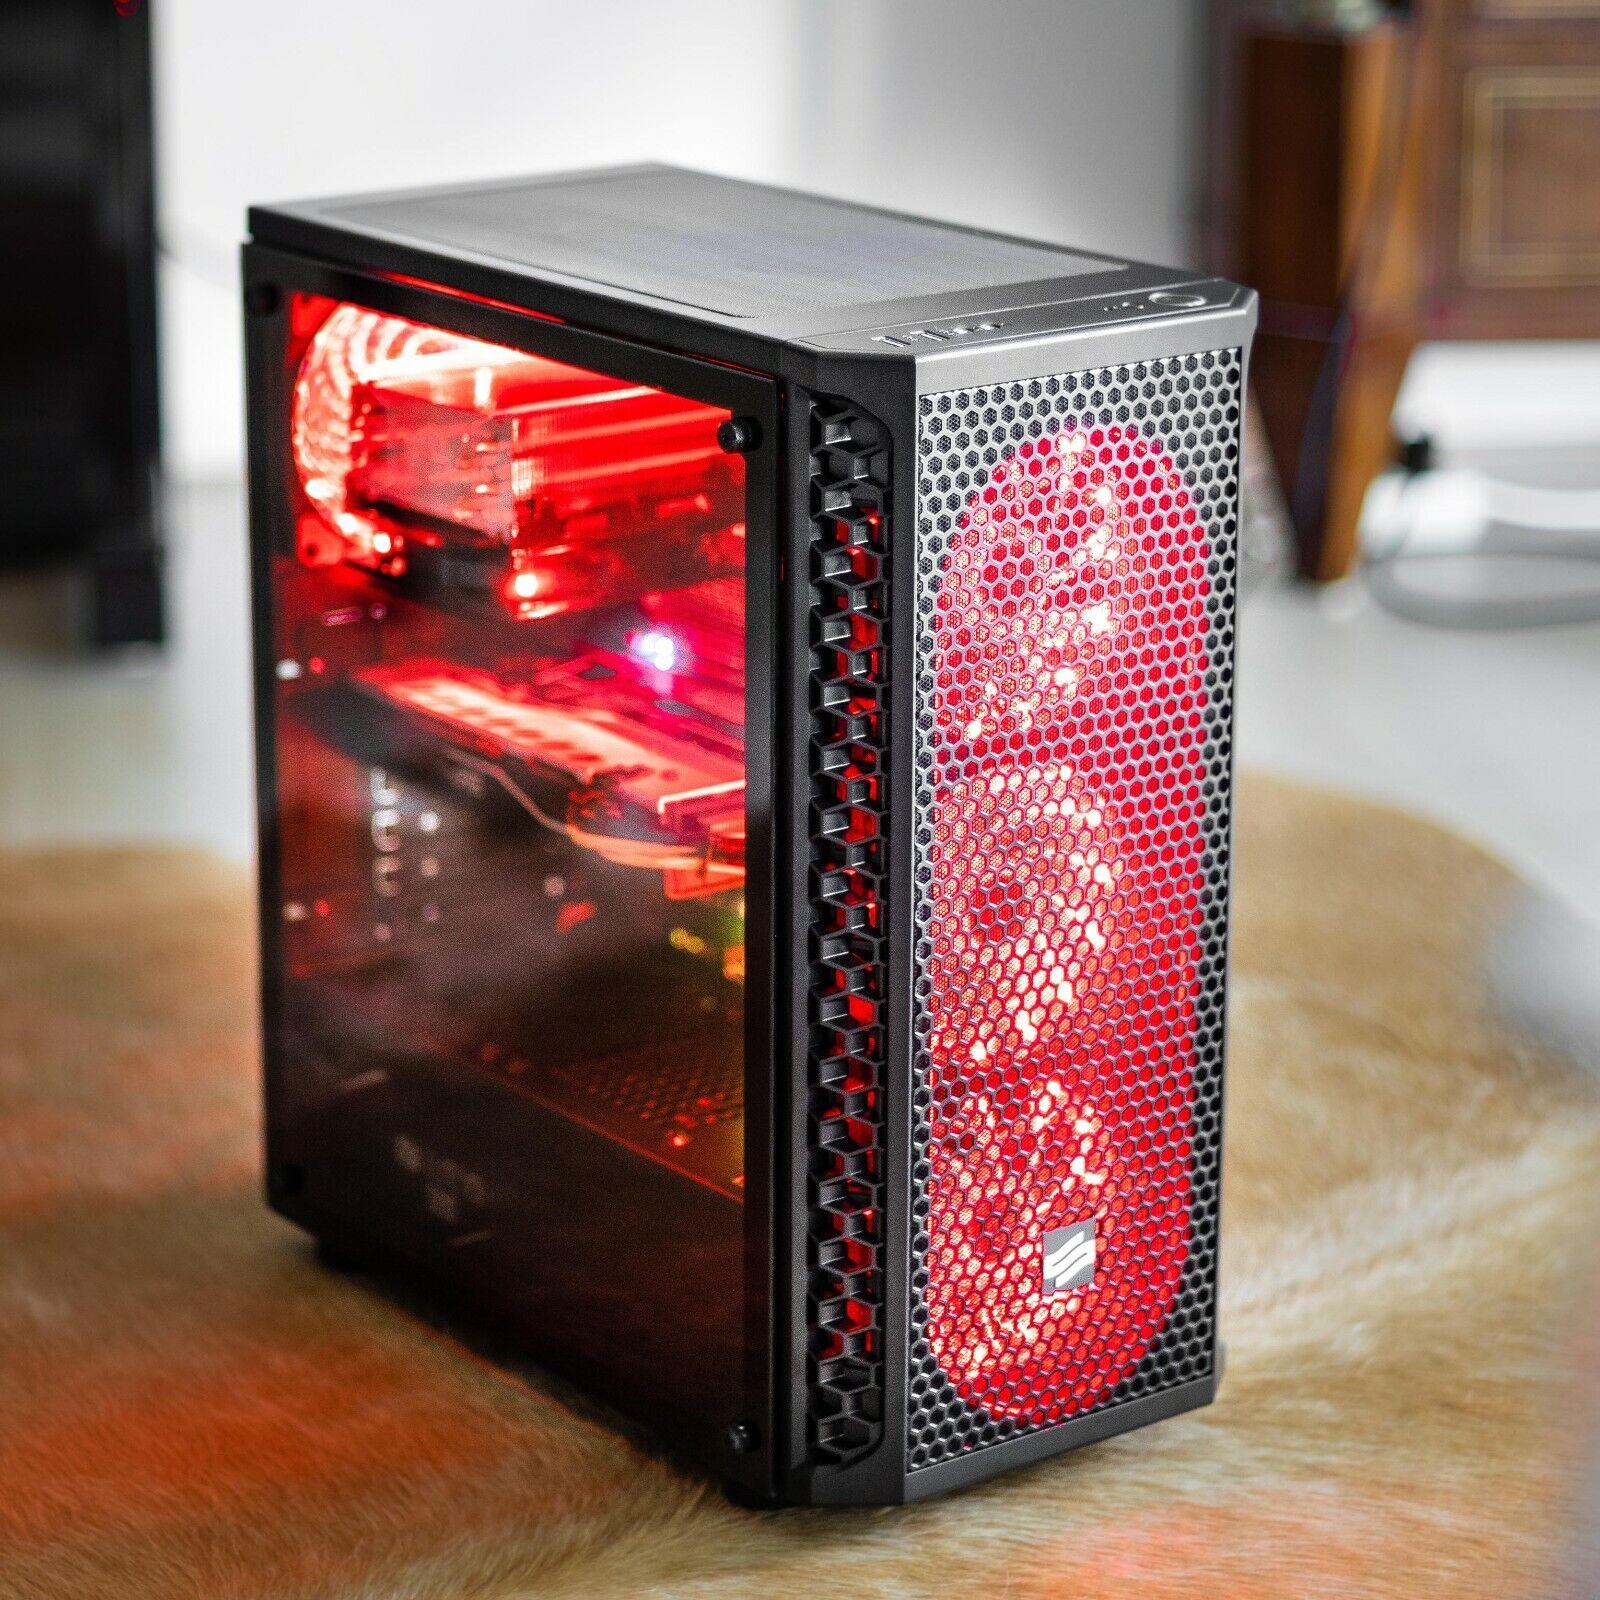 32GB RAM 6x4.3GHz AMD RX580 240GB SSD+1000GB Wlan Win10 Pro Gaming PC